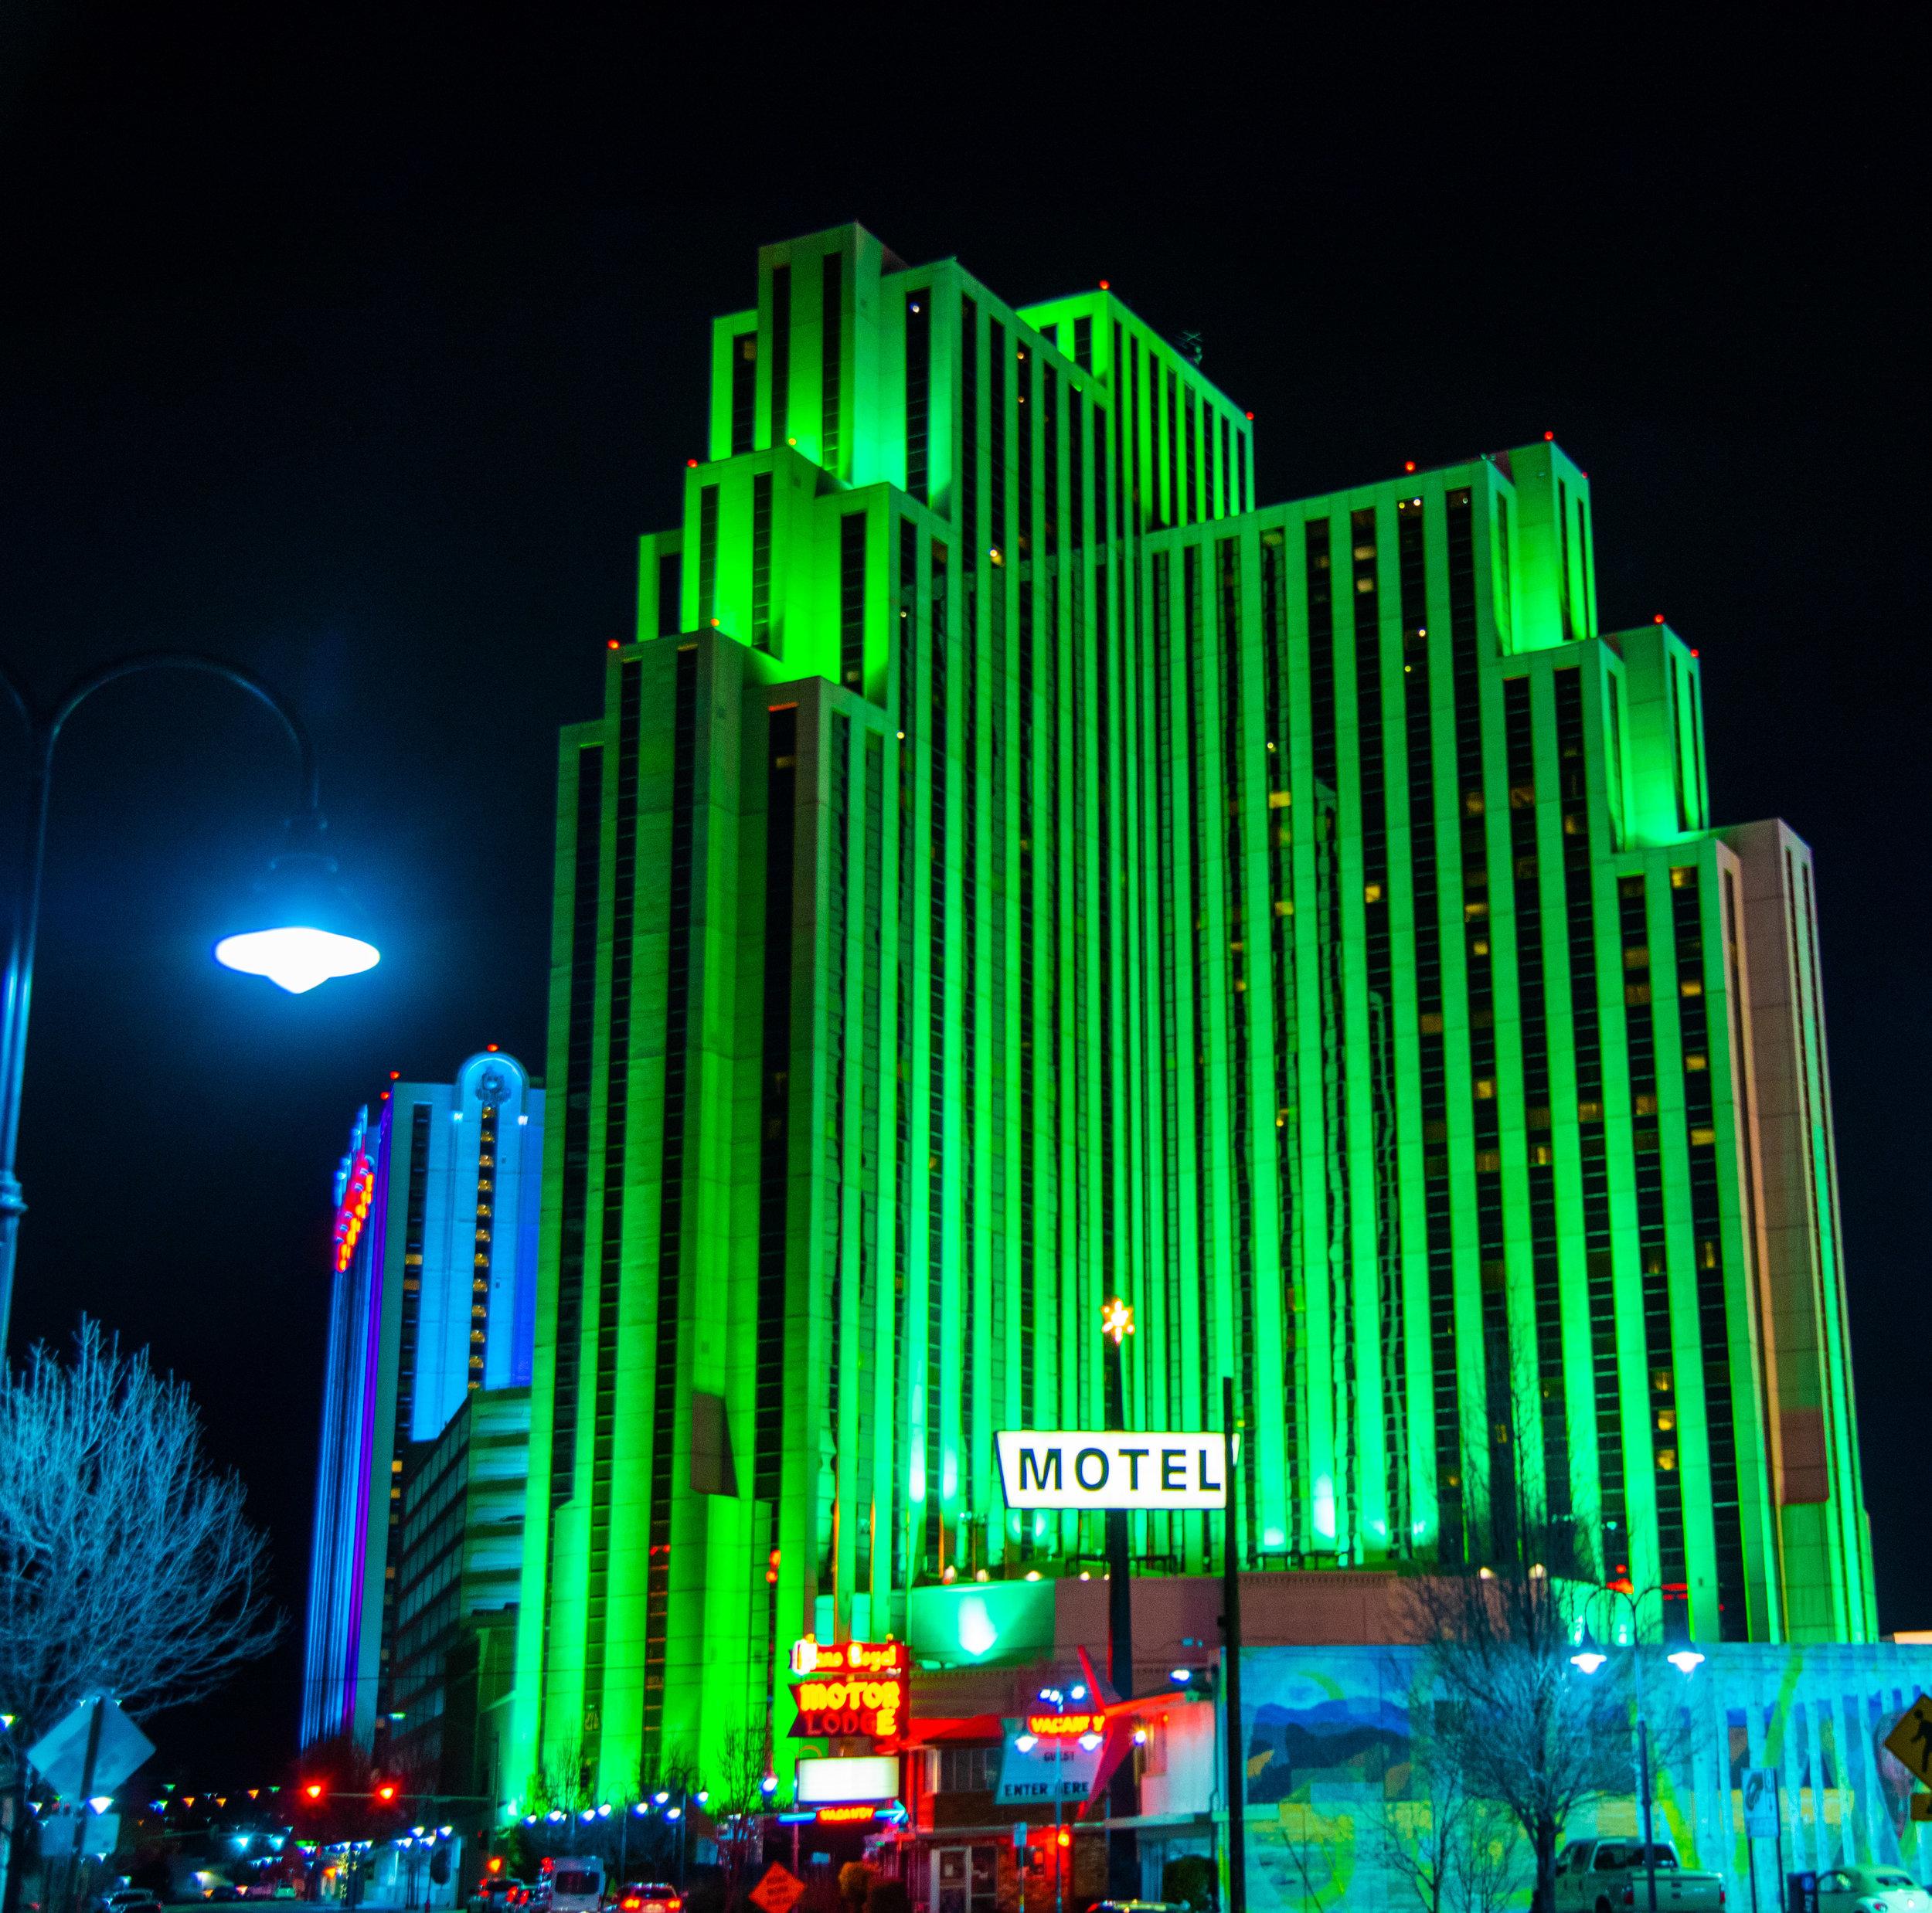 20496922-JosephRosen_The_Green_Building_3.24MB_2019.jpg